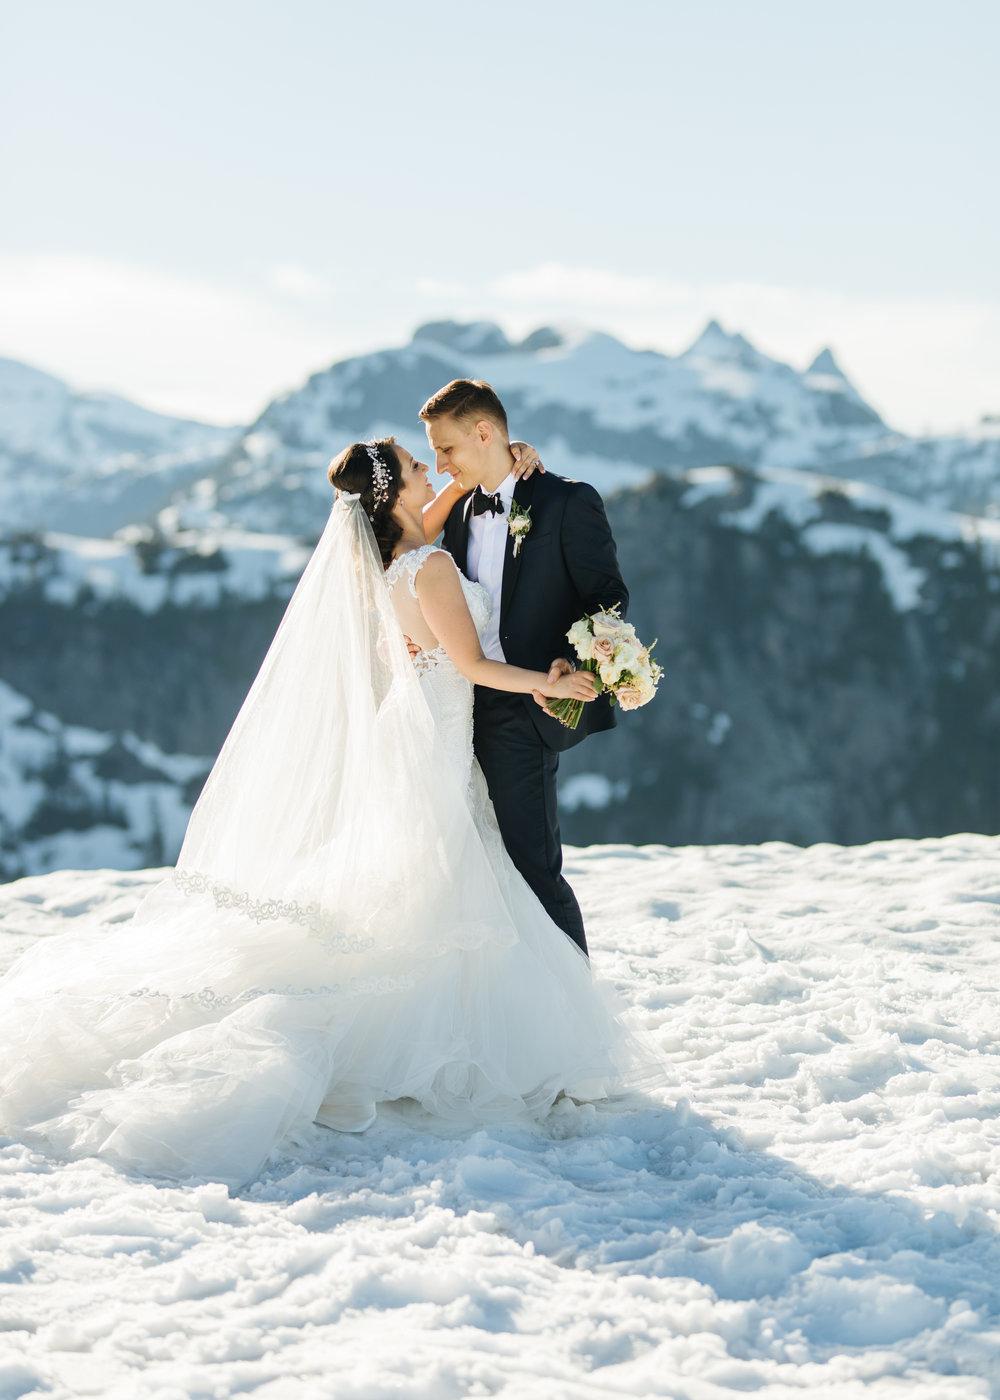 herastudios_wedding_maryana_andrey_hera_selects-47.jpg